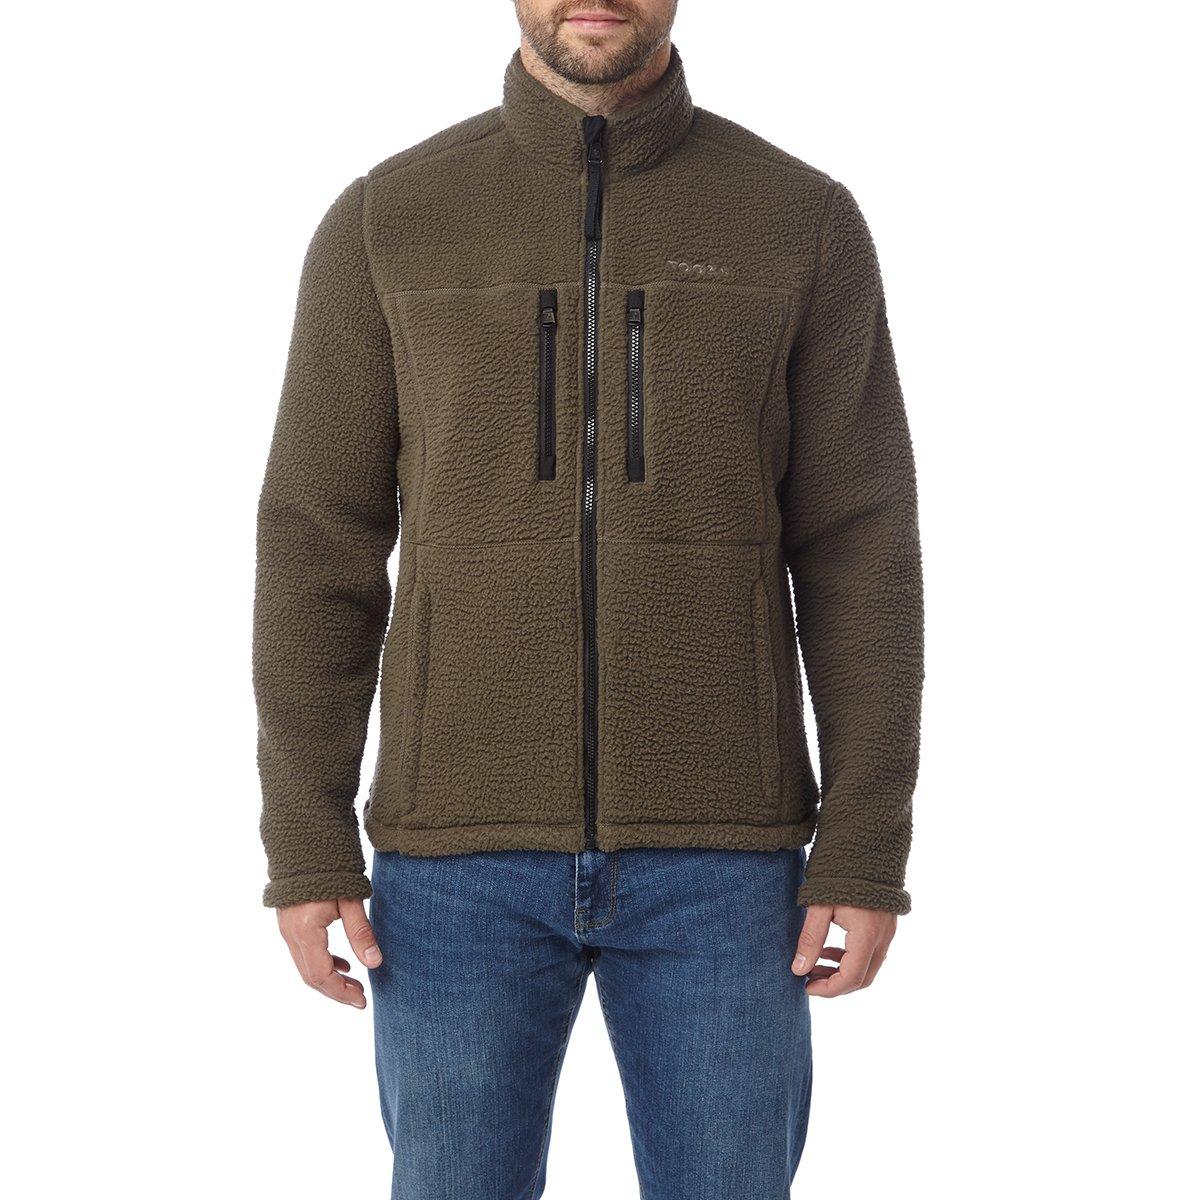 Tog24 Leonard Mens Sherpa Fleece Jacket Navy/dark kahki - £24 @ Dispatched from and sold by TOG24